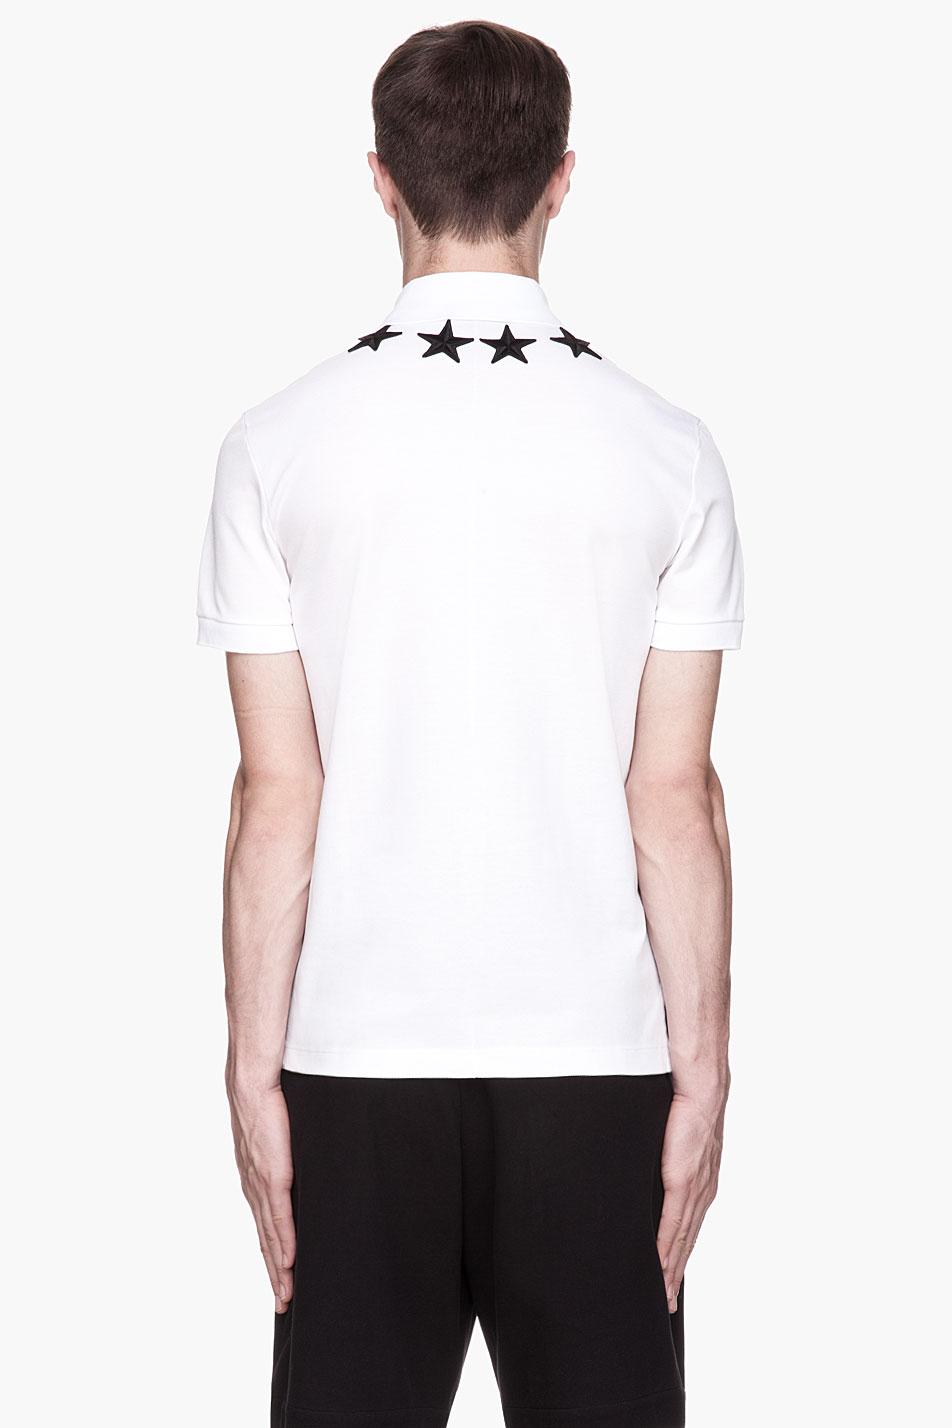 5fe0535c7e6c8 Givenchy White Star Appliqu Polo in Black for Men